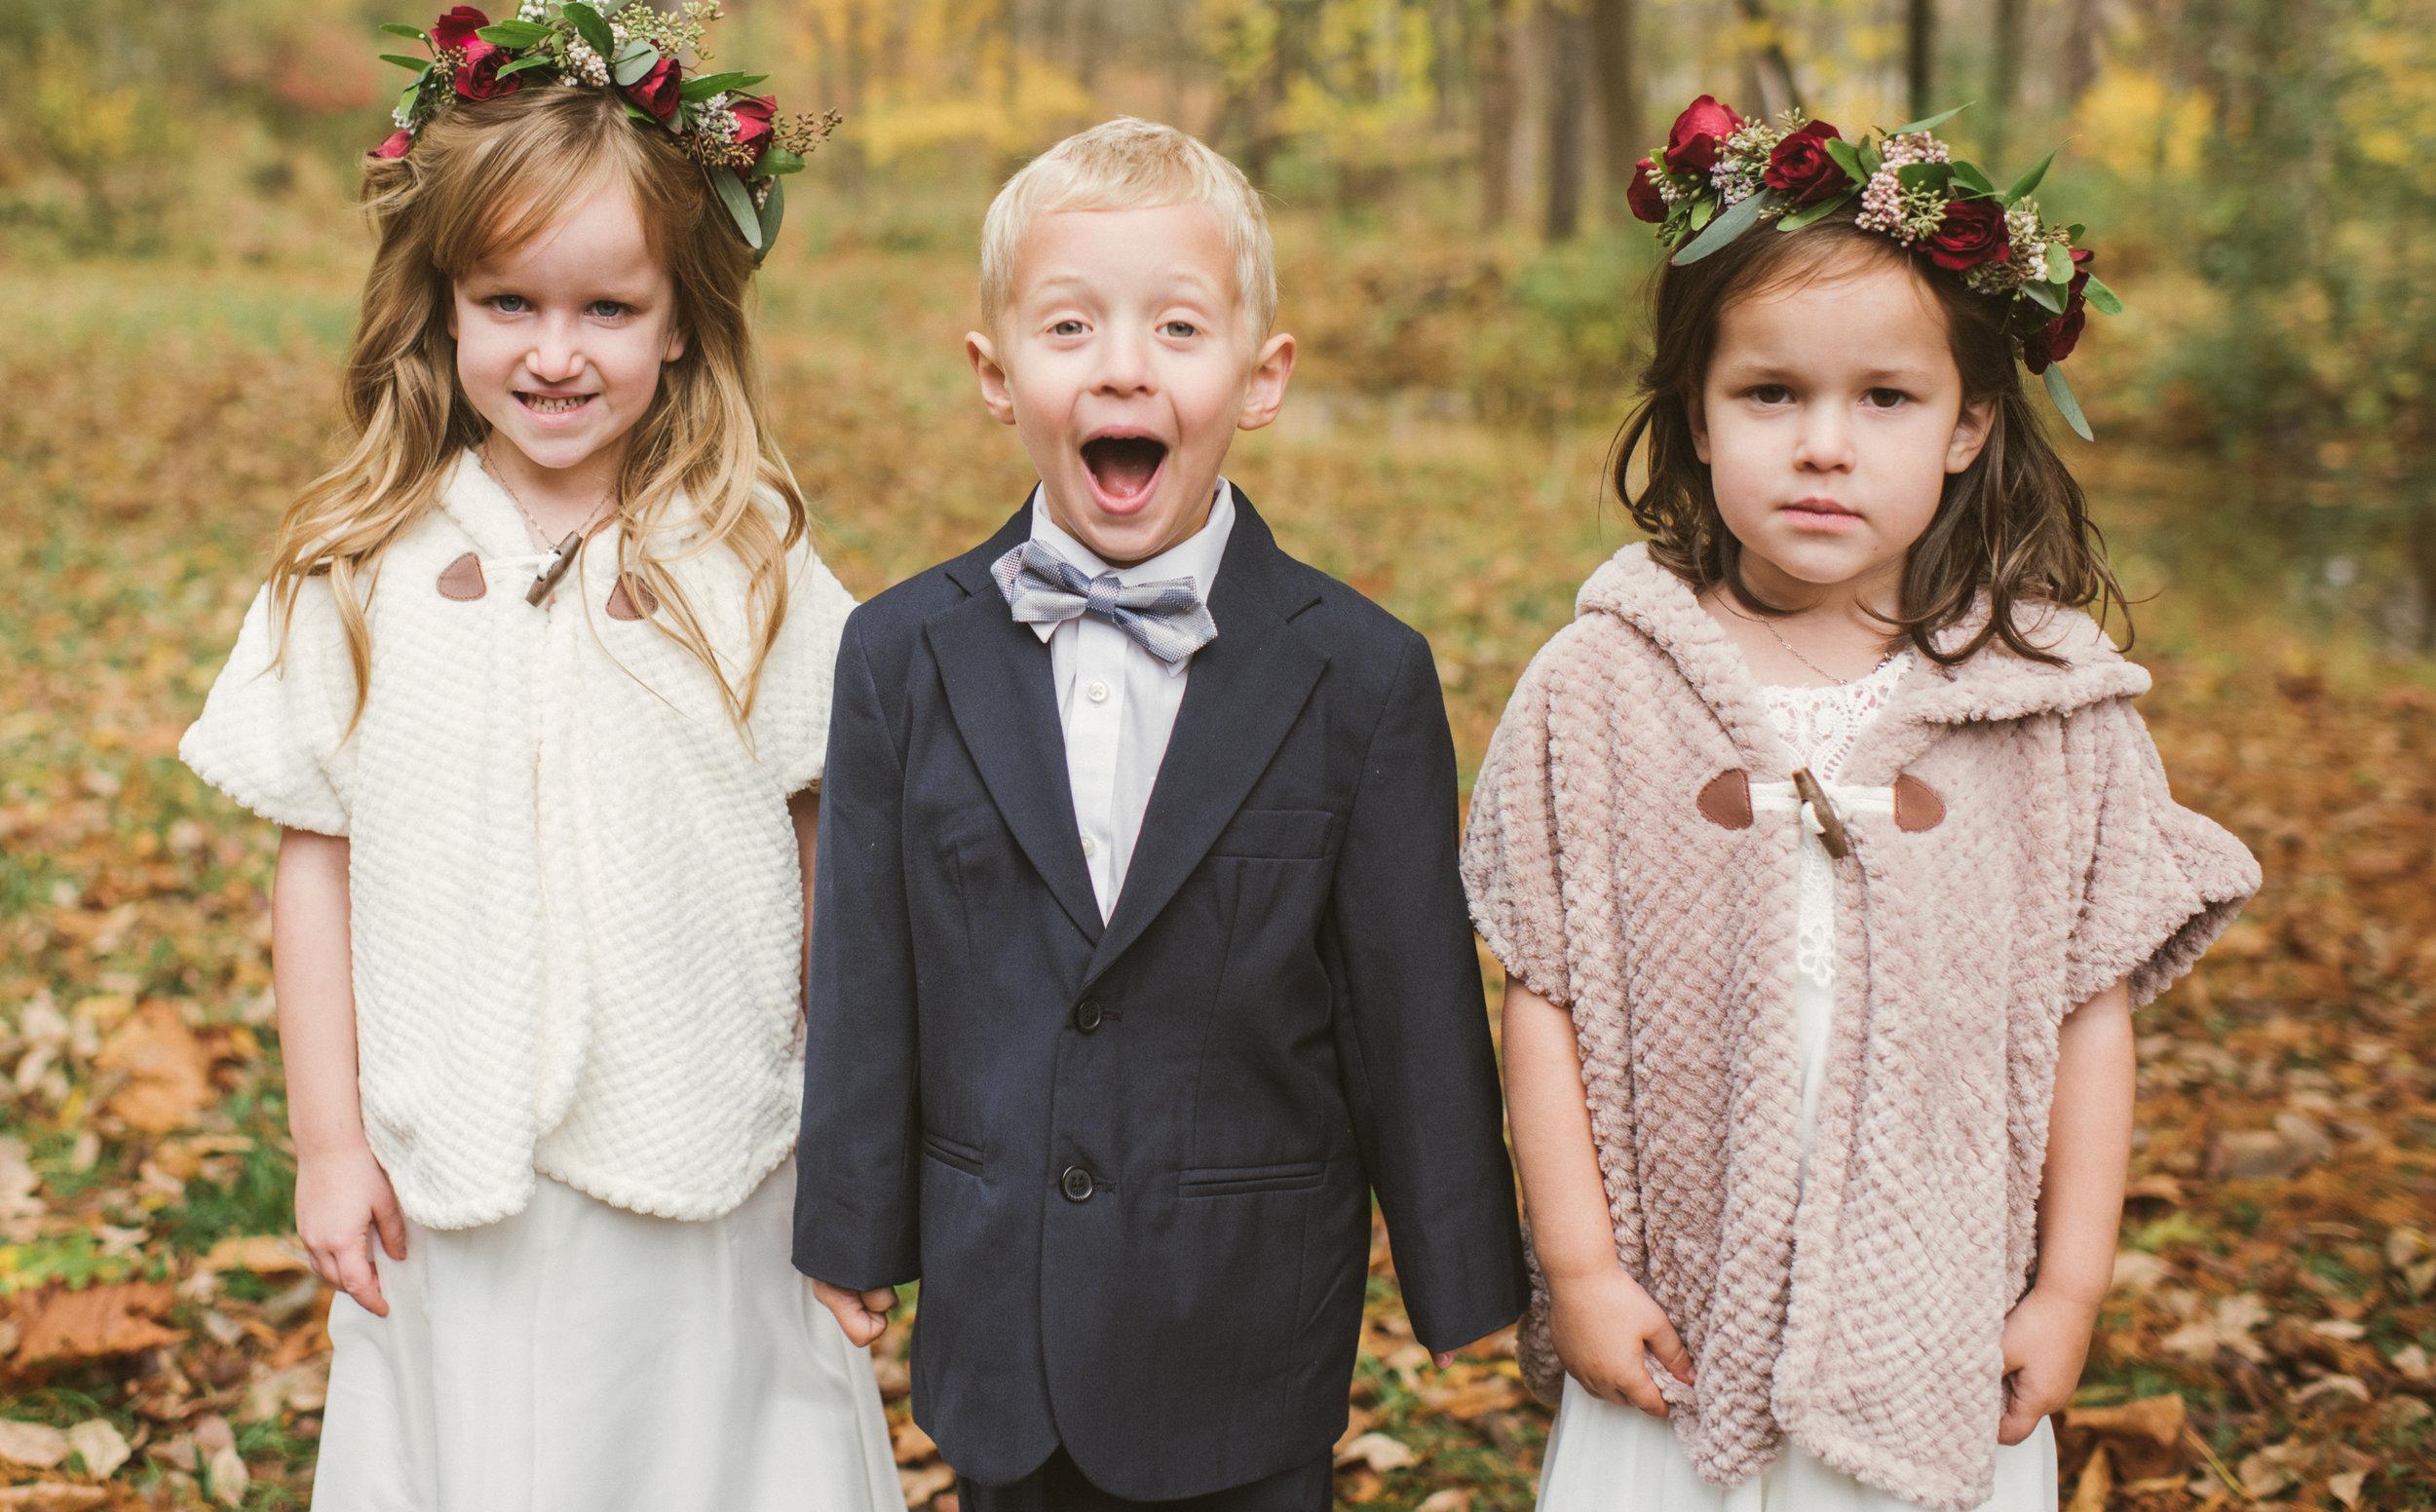 JACQUELINE & ANDREW WARSHAWER -BROOKMILL FARM FALL WEDDING - INTIMATE WEDDING PHOTOGRAPHER - TWOTWENTY by CHI-CHI AGBIM-362.jpg